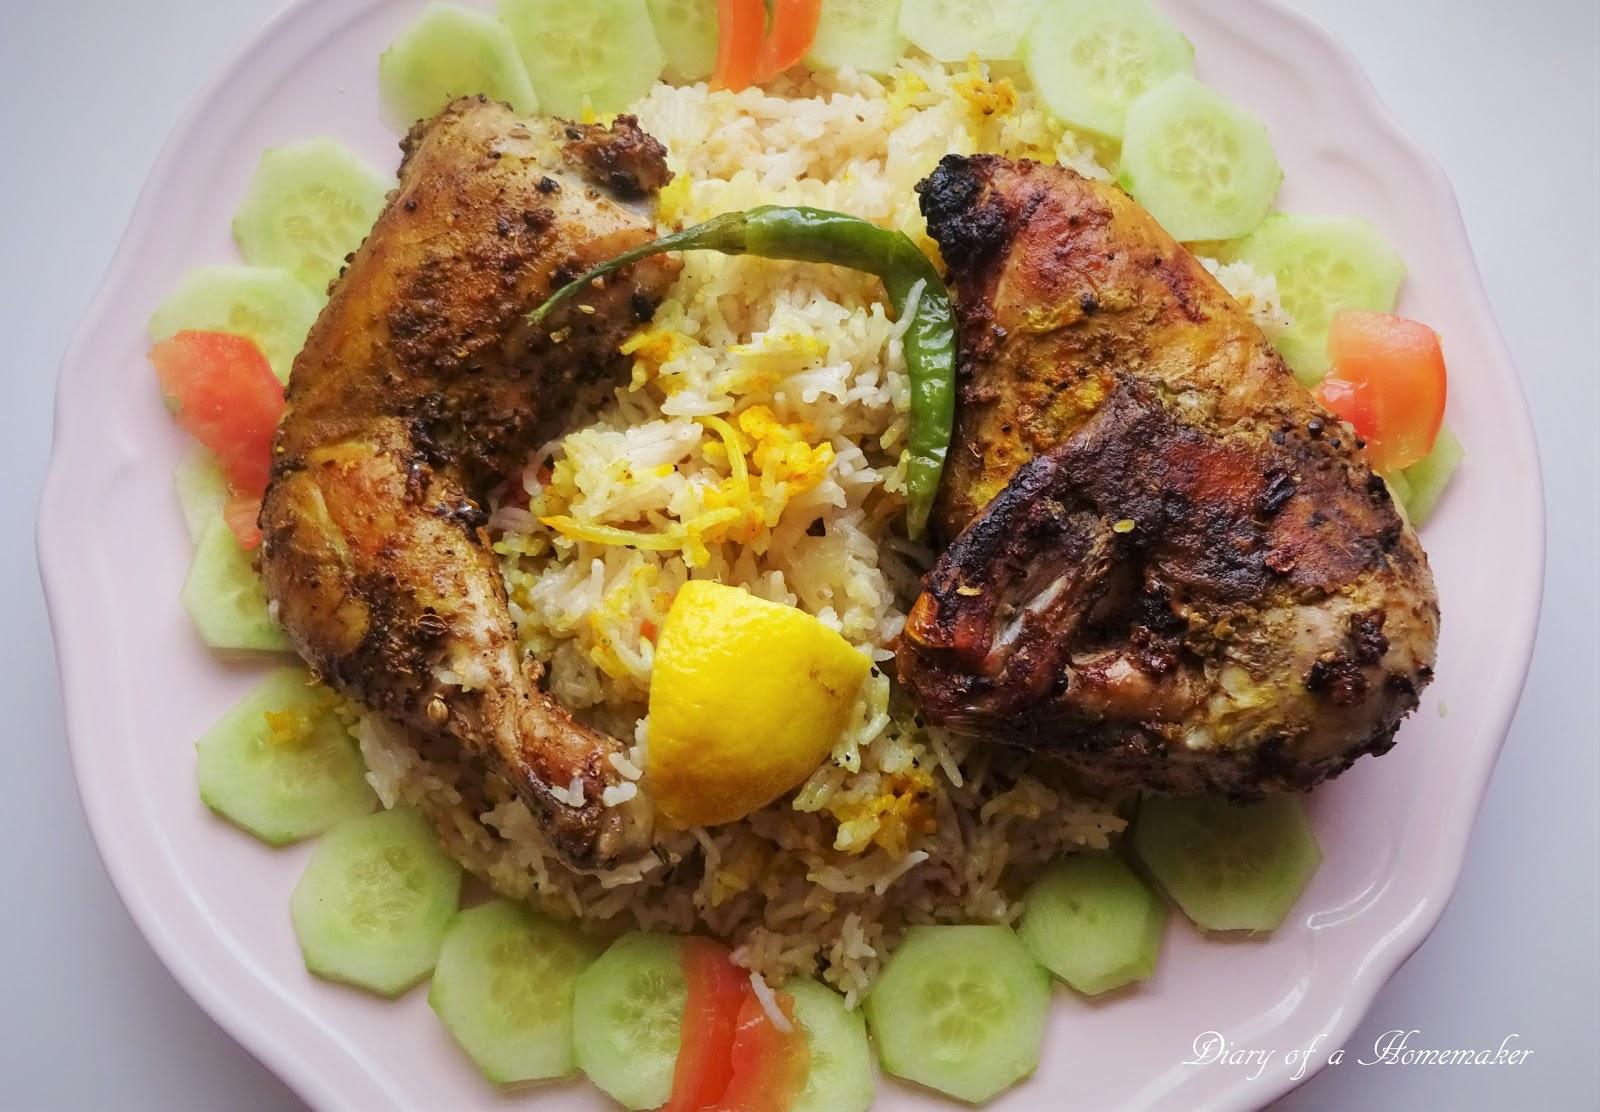 Indian food recipes indian recipes desi food desi recipes mandi chicchickenken yemeni food arabic recipe rice lemon forumfinder Choice Image